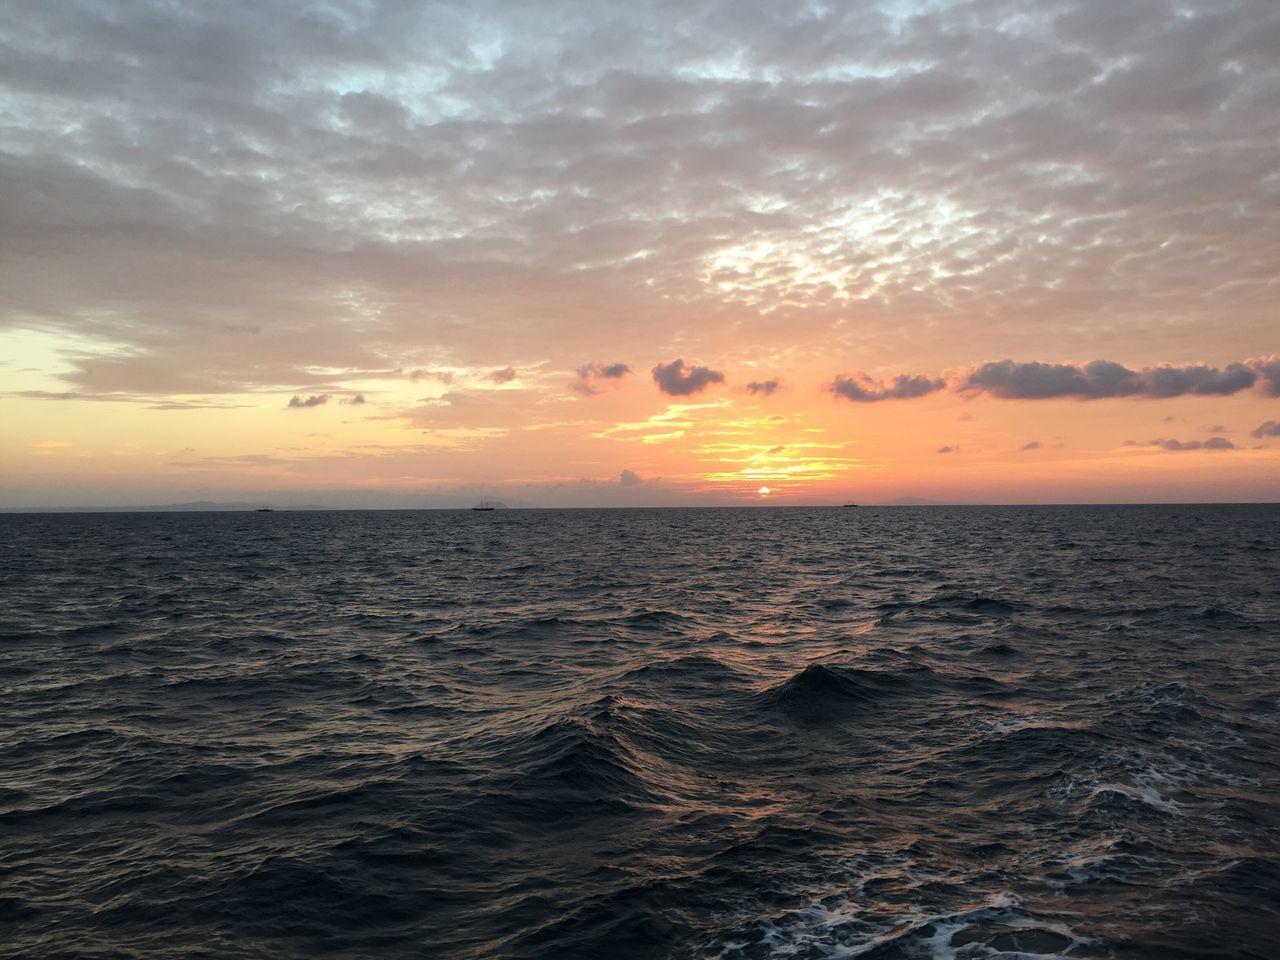 Horizon Over Water Sunset peace Tranquil Scene Sky